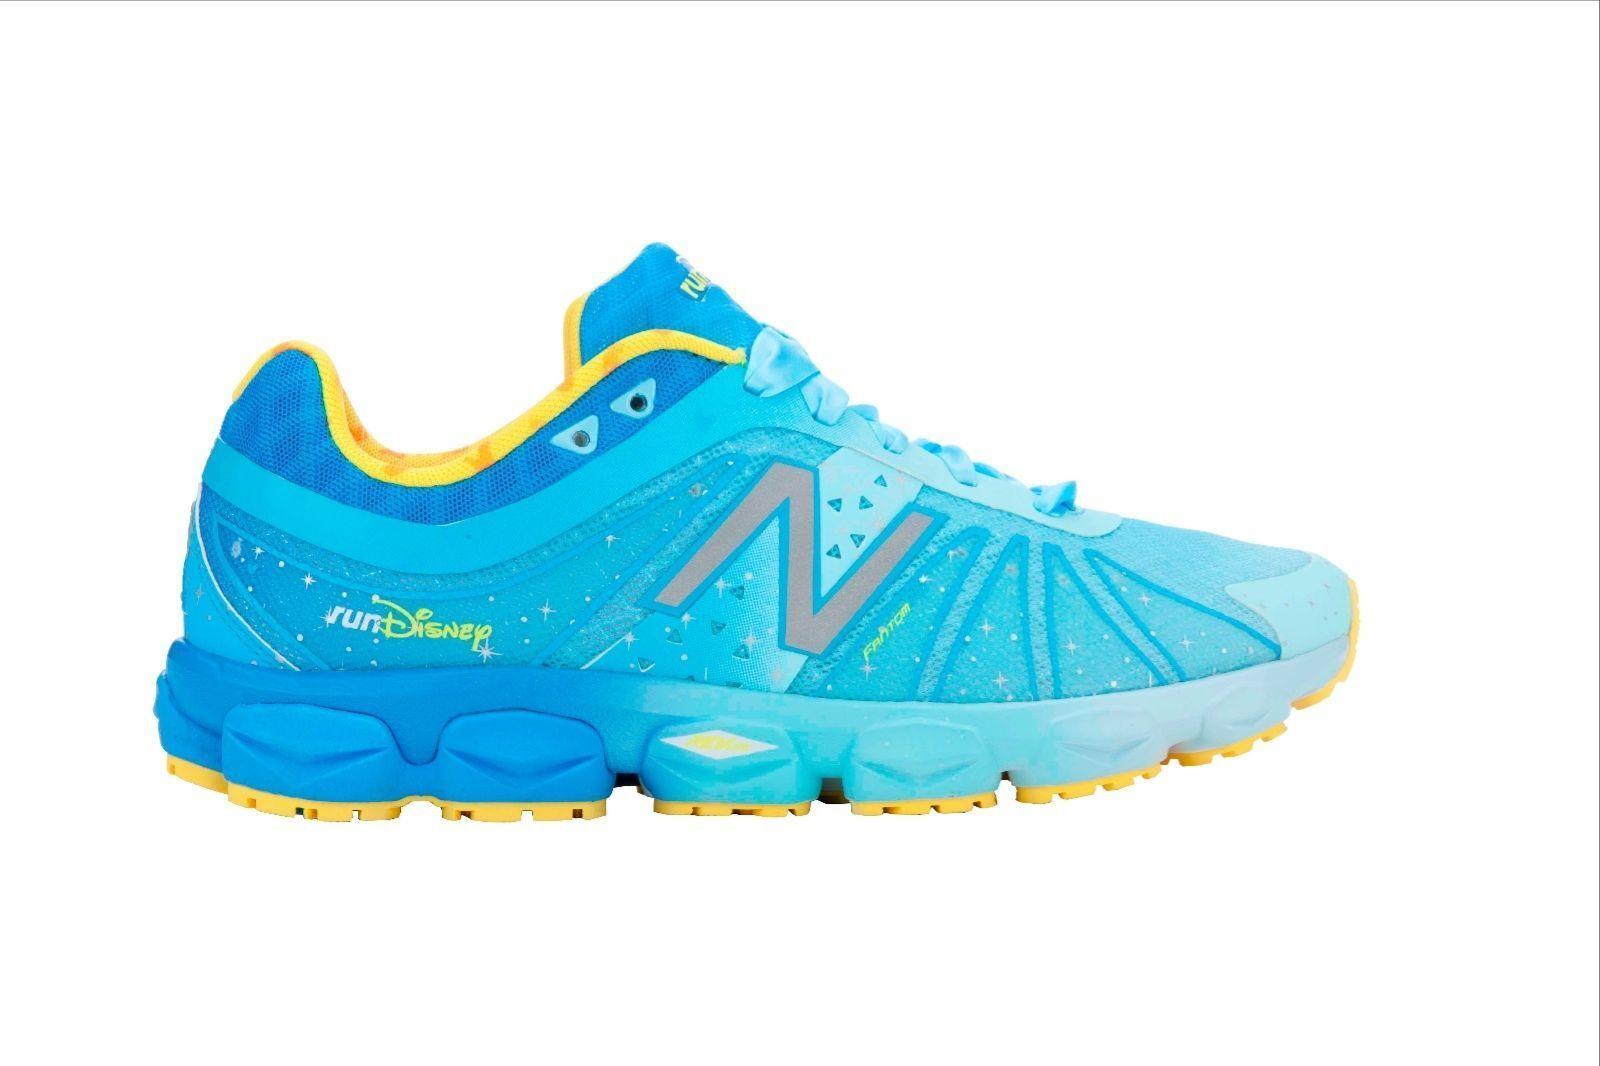 New Balance Run NEW Disney Princess Cinderella schuhes Size 10.5 NEW Run IN BOX 42346c